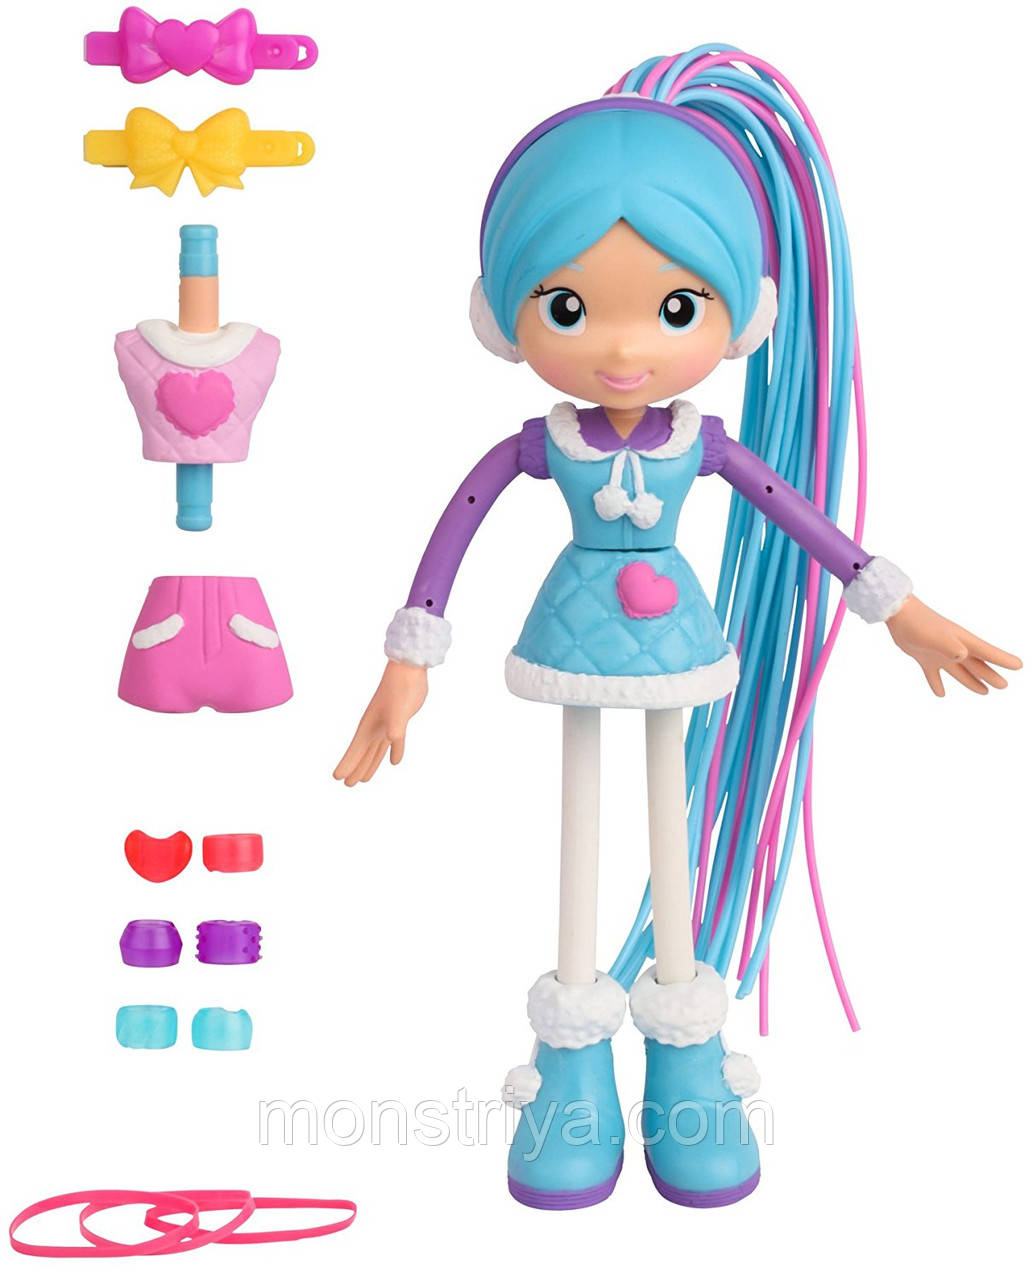 Кукла-конструктор Бетти Спагетти Бэтти Зимний стиль Betty Spaghetty